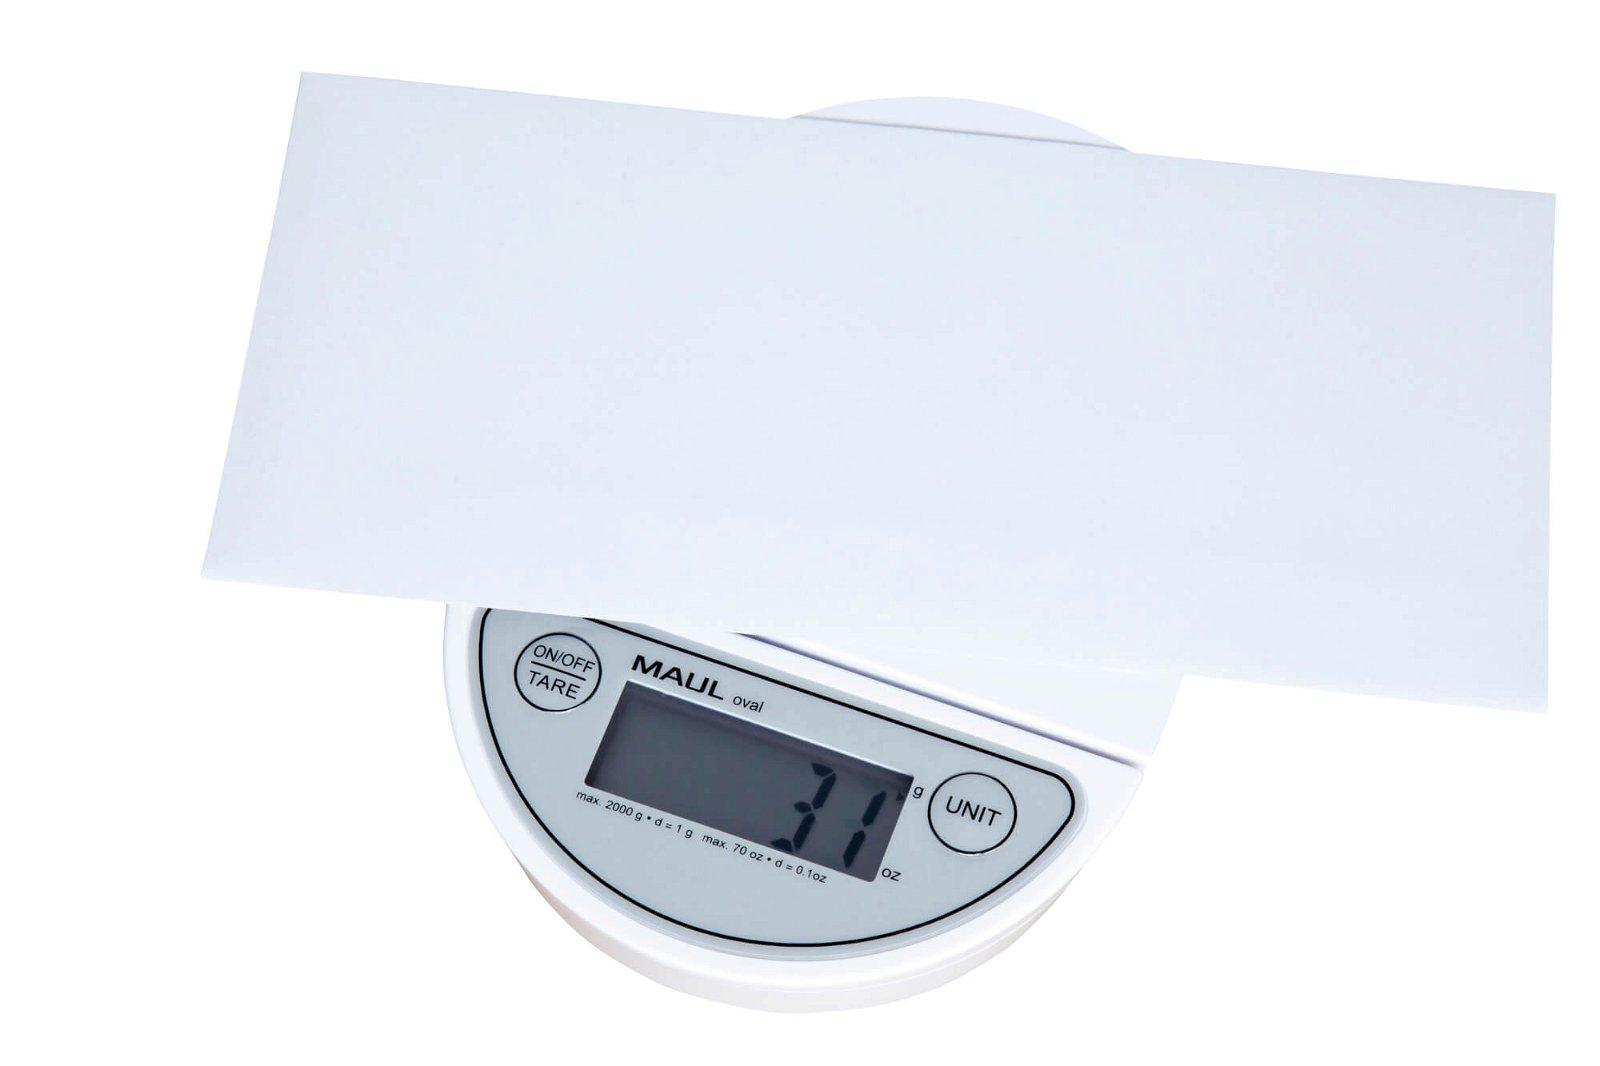 Briefwaage MAULoval mit Batterie, 2000 g, weiß